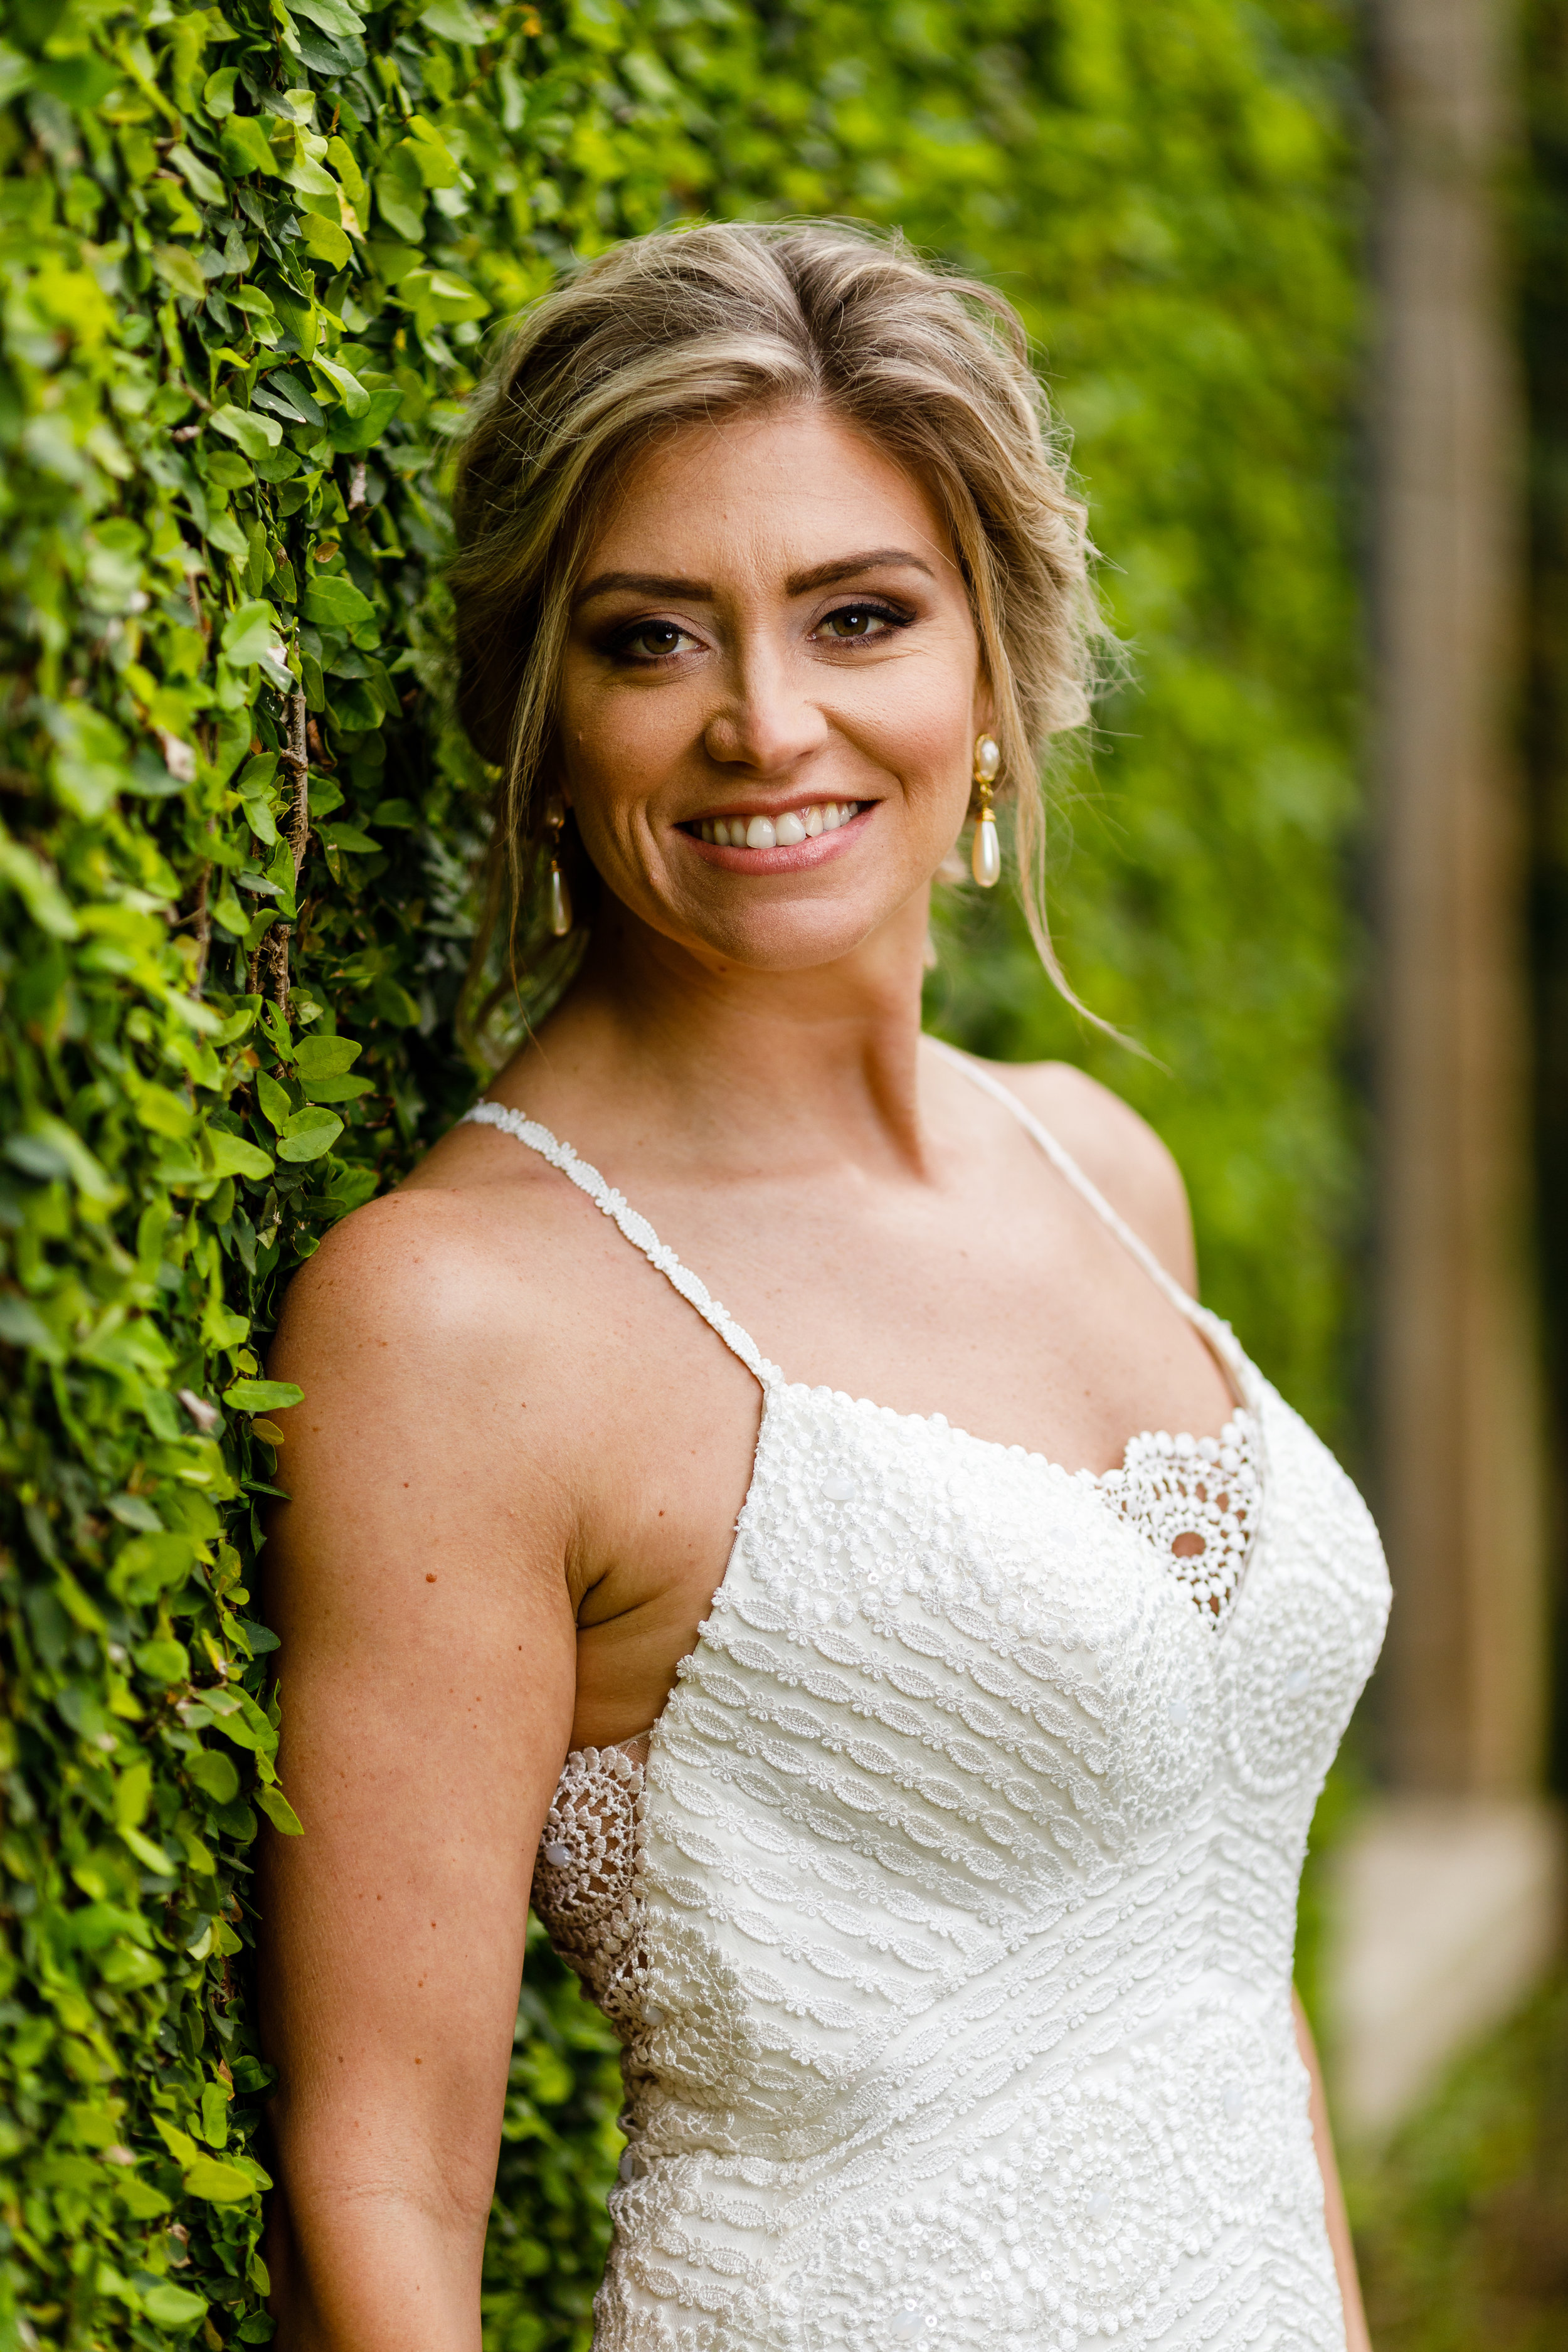 Youngsville-lafayette-portrait-family-wedding-photographer-2933.jpg